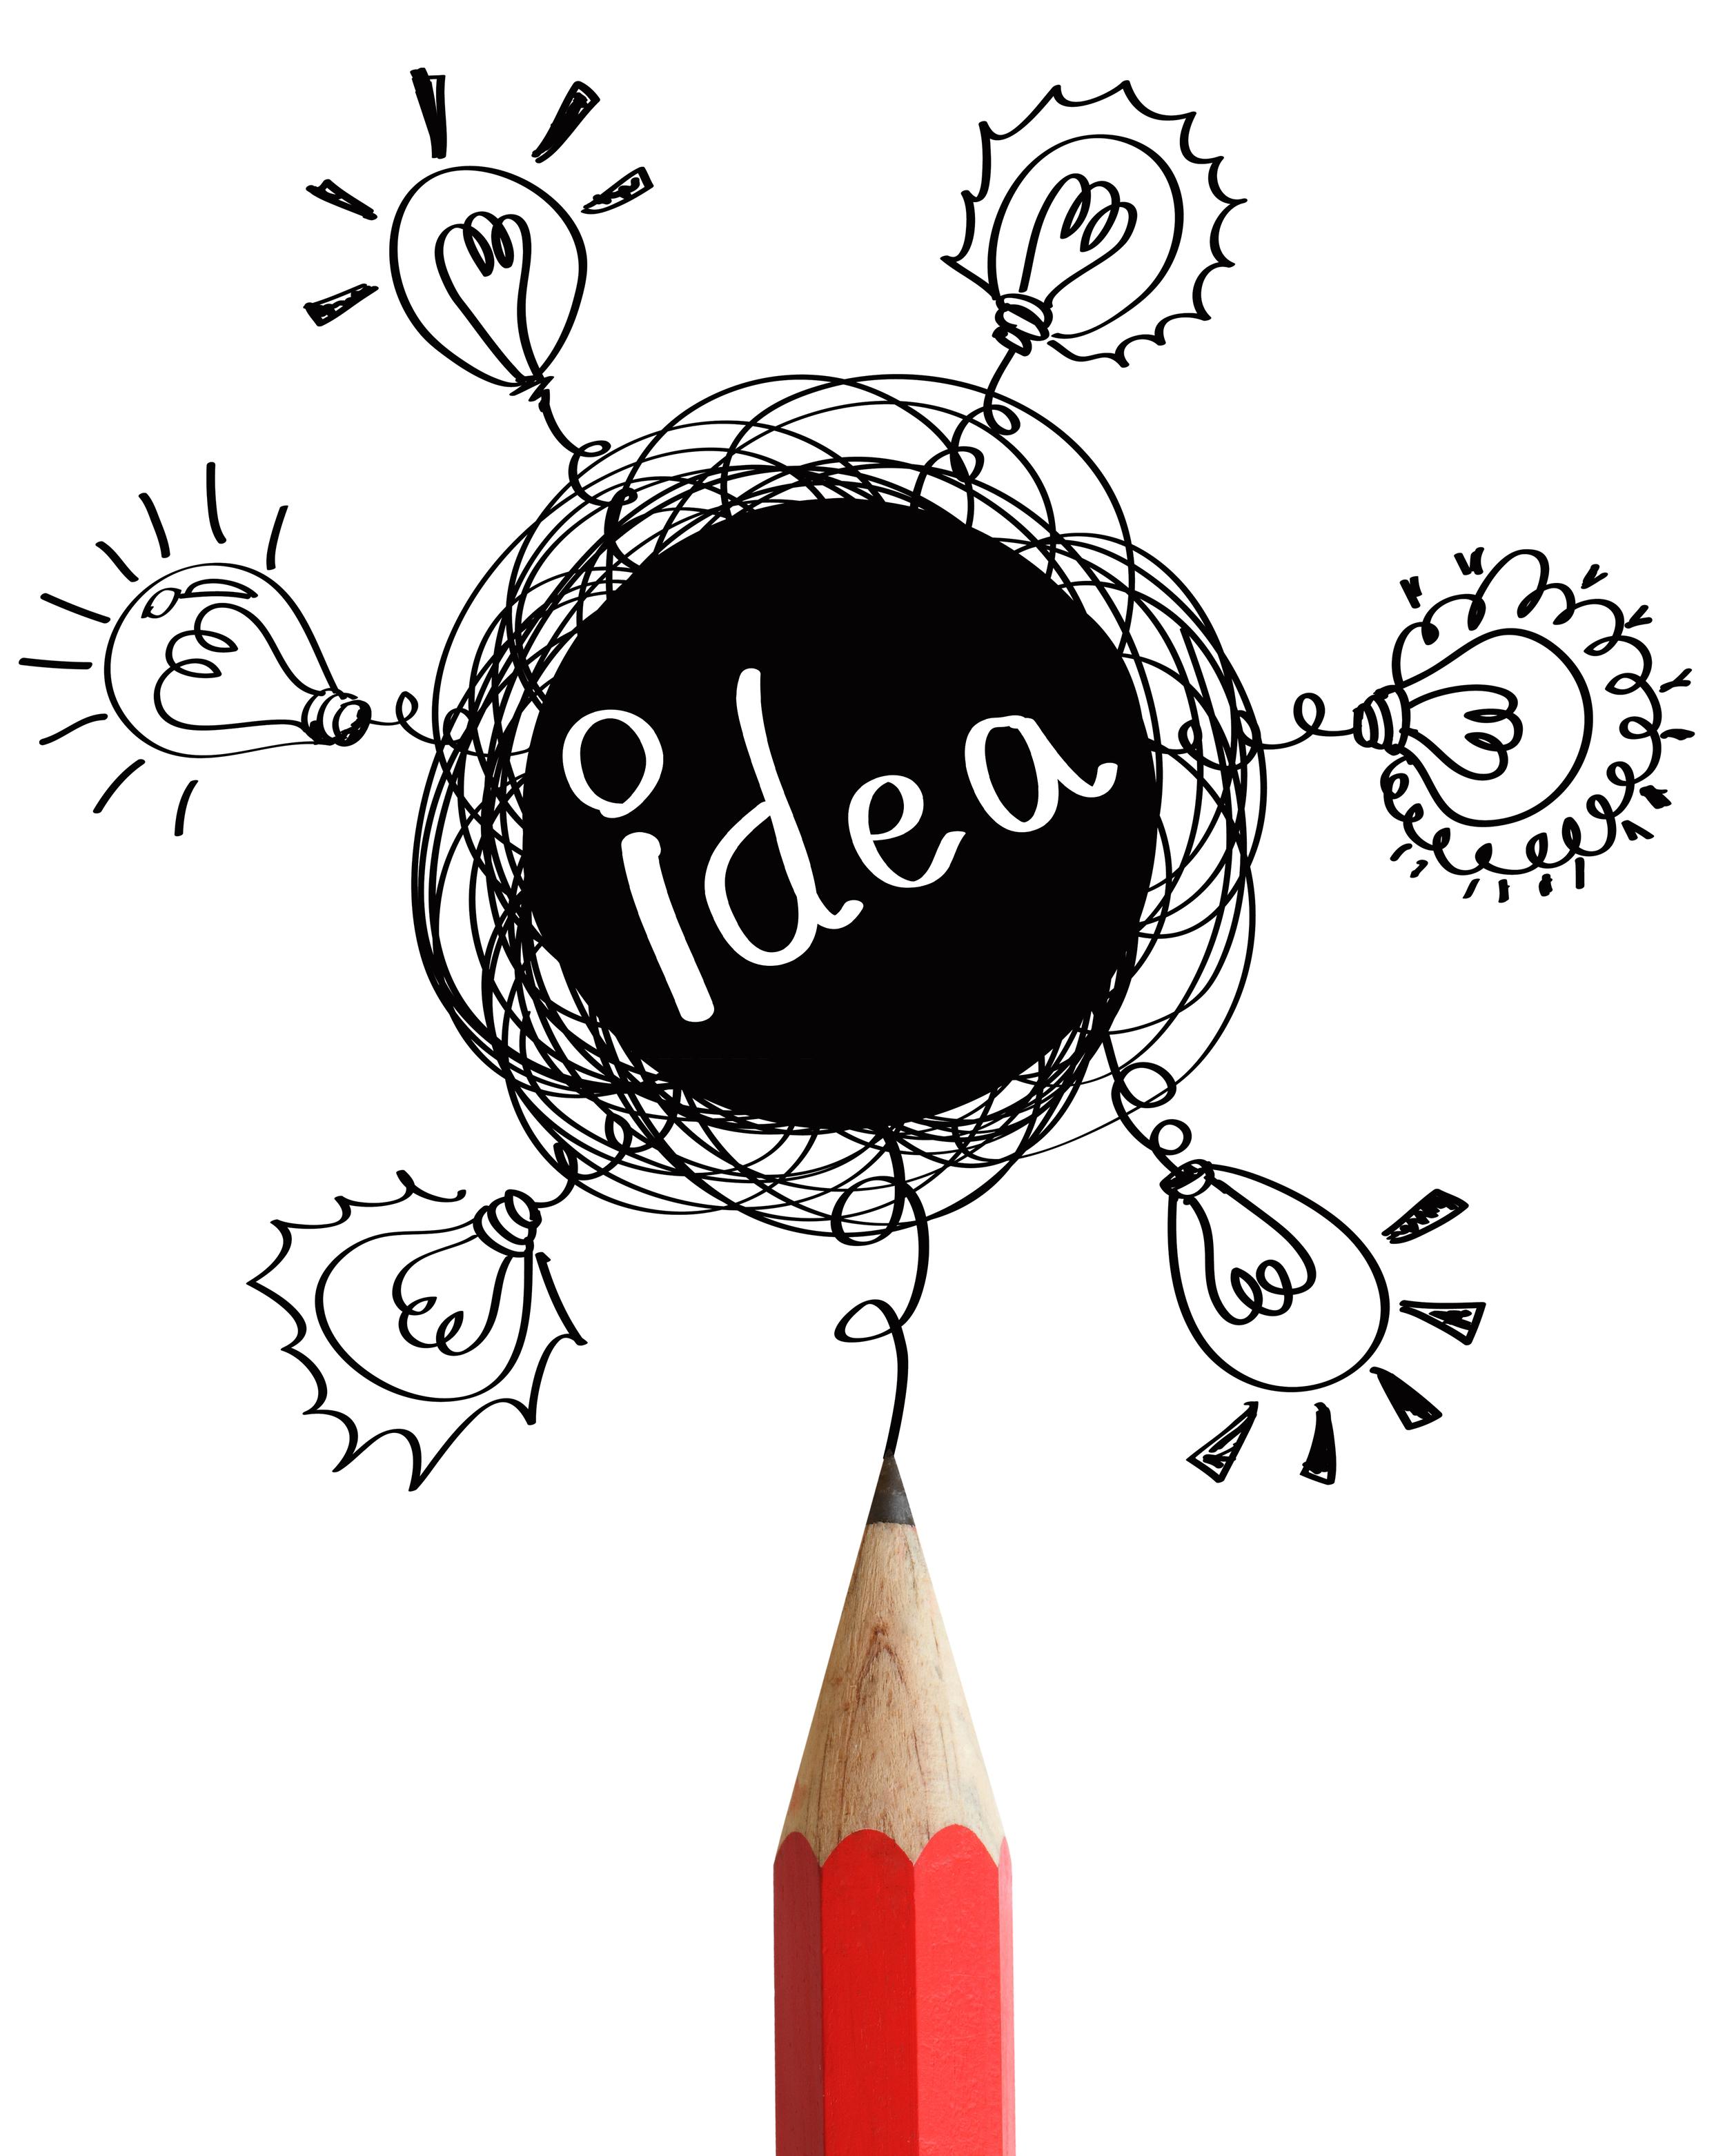 ideas2.jpg